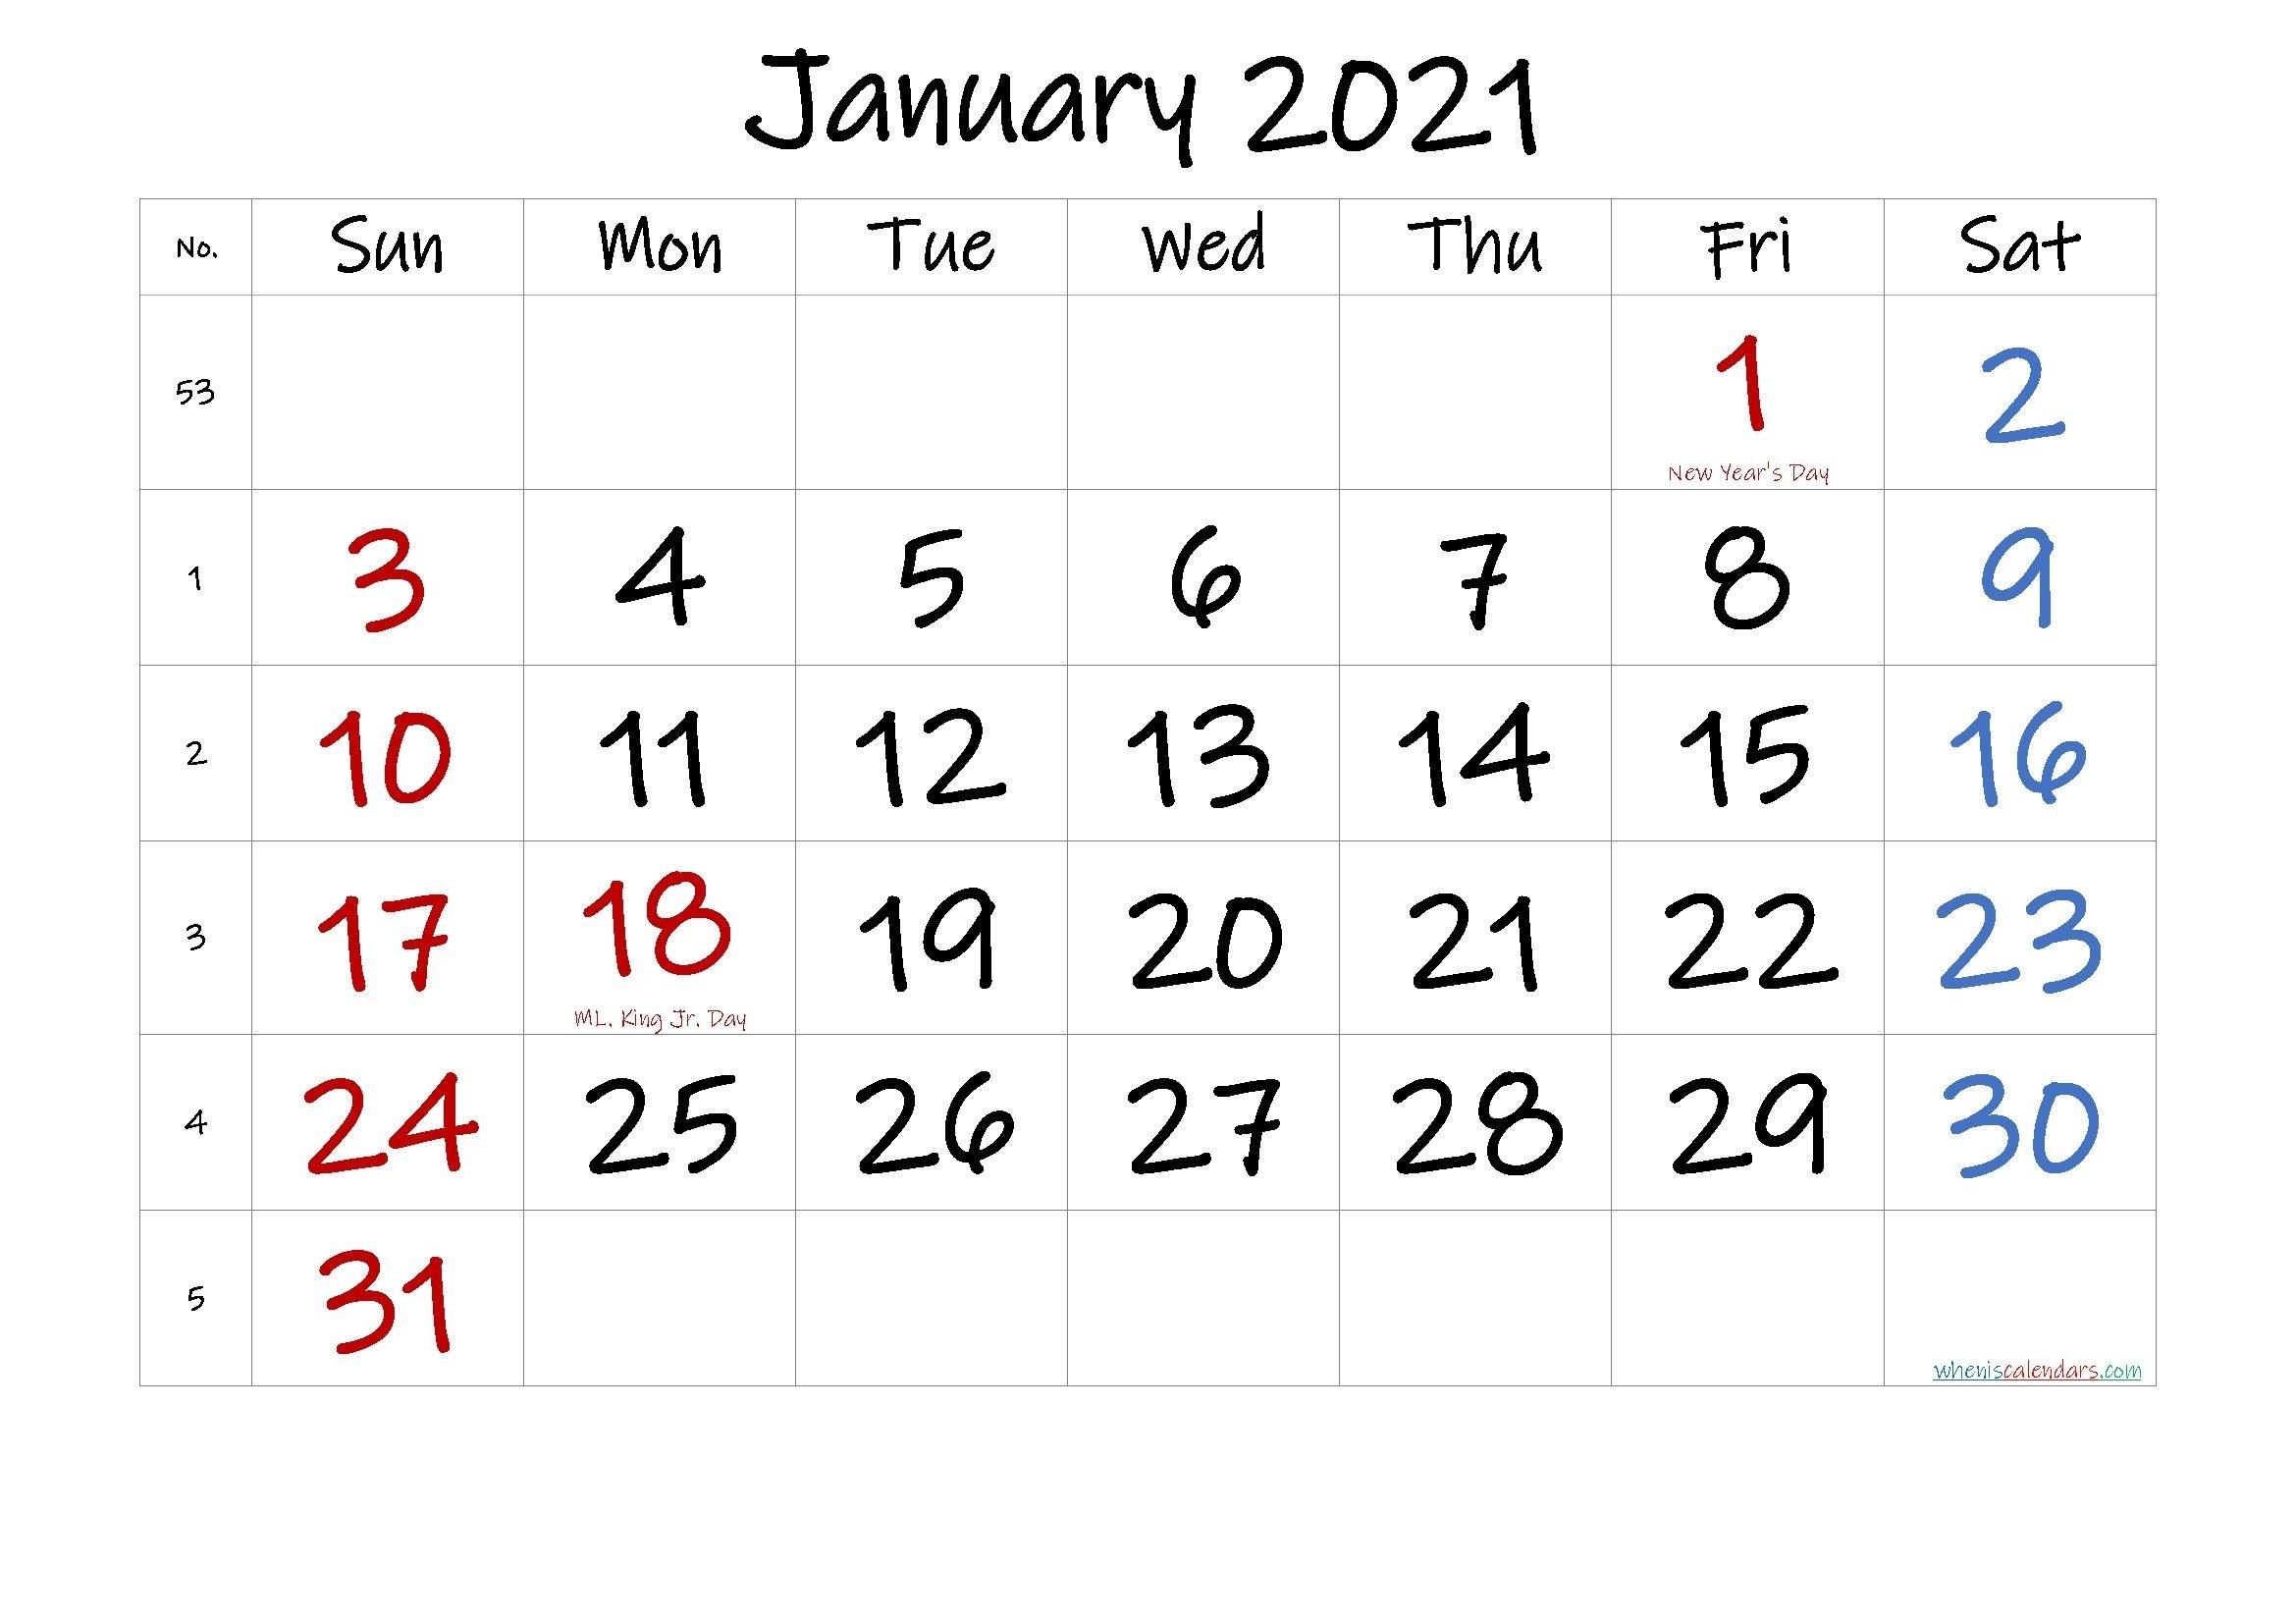 20+ Calendar For January 2021 - Free Download Printable Calendar Templates ️ Wiki Calendar August 2021